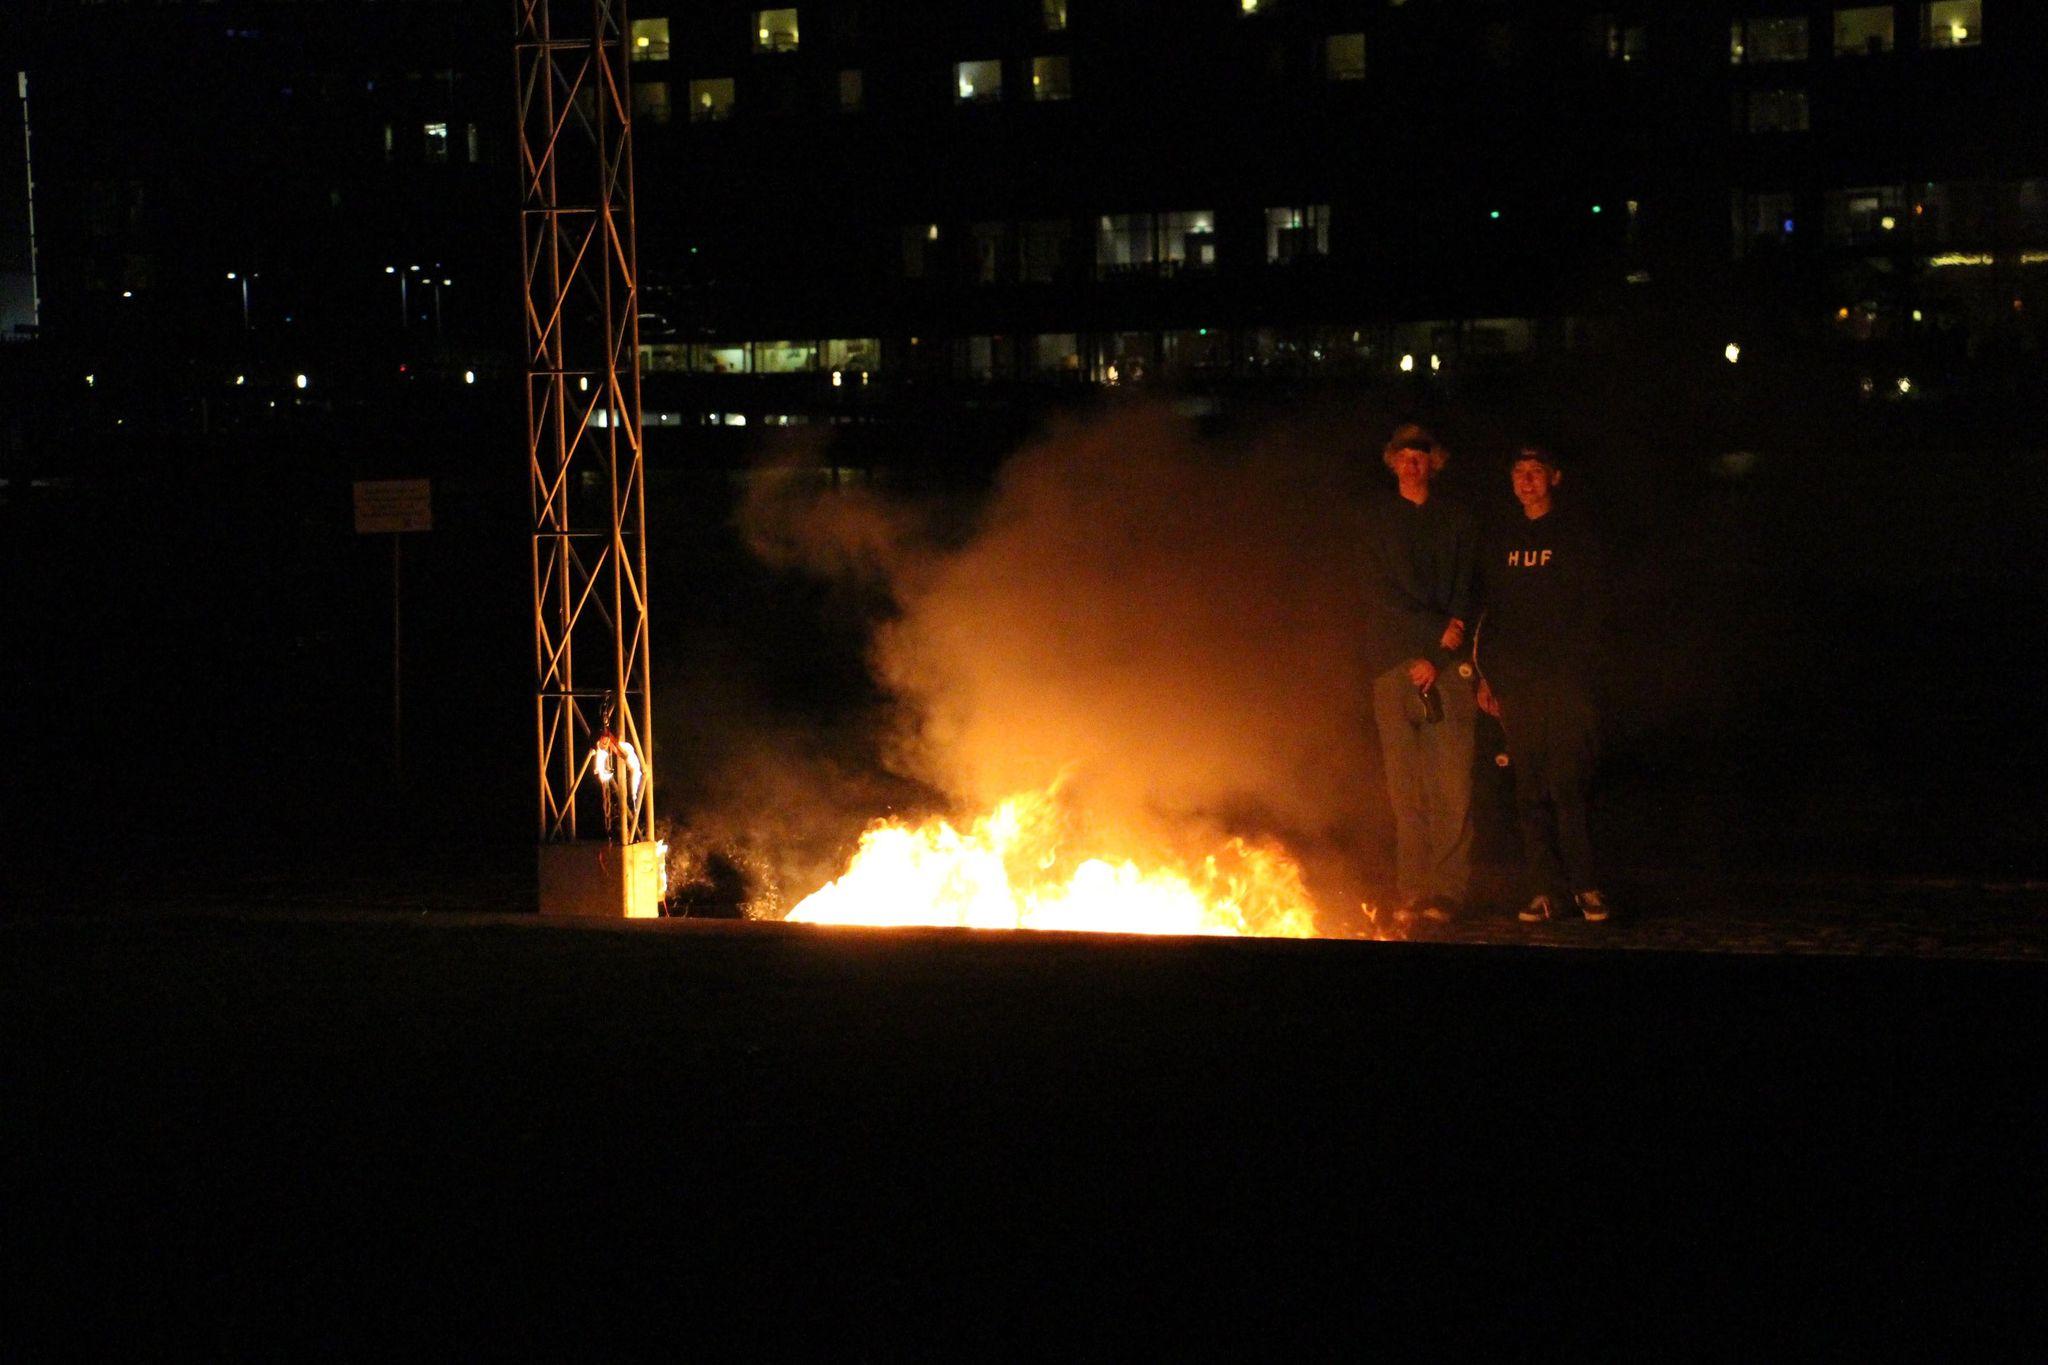 Brand på Islands Brygge